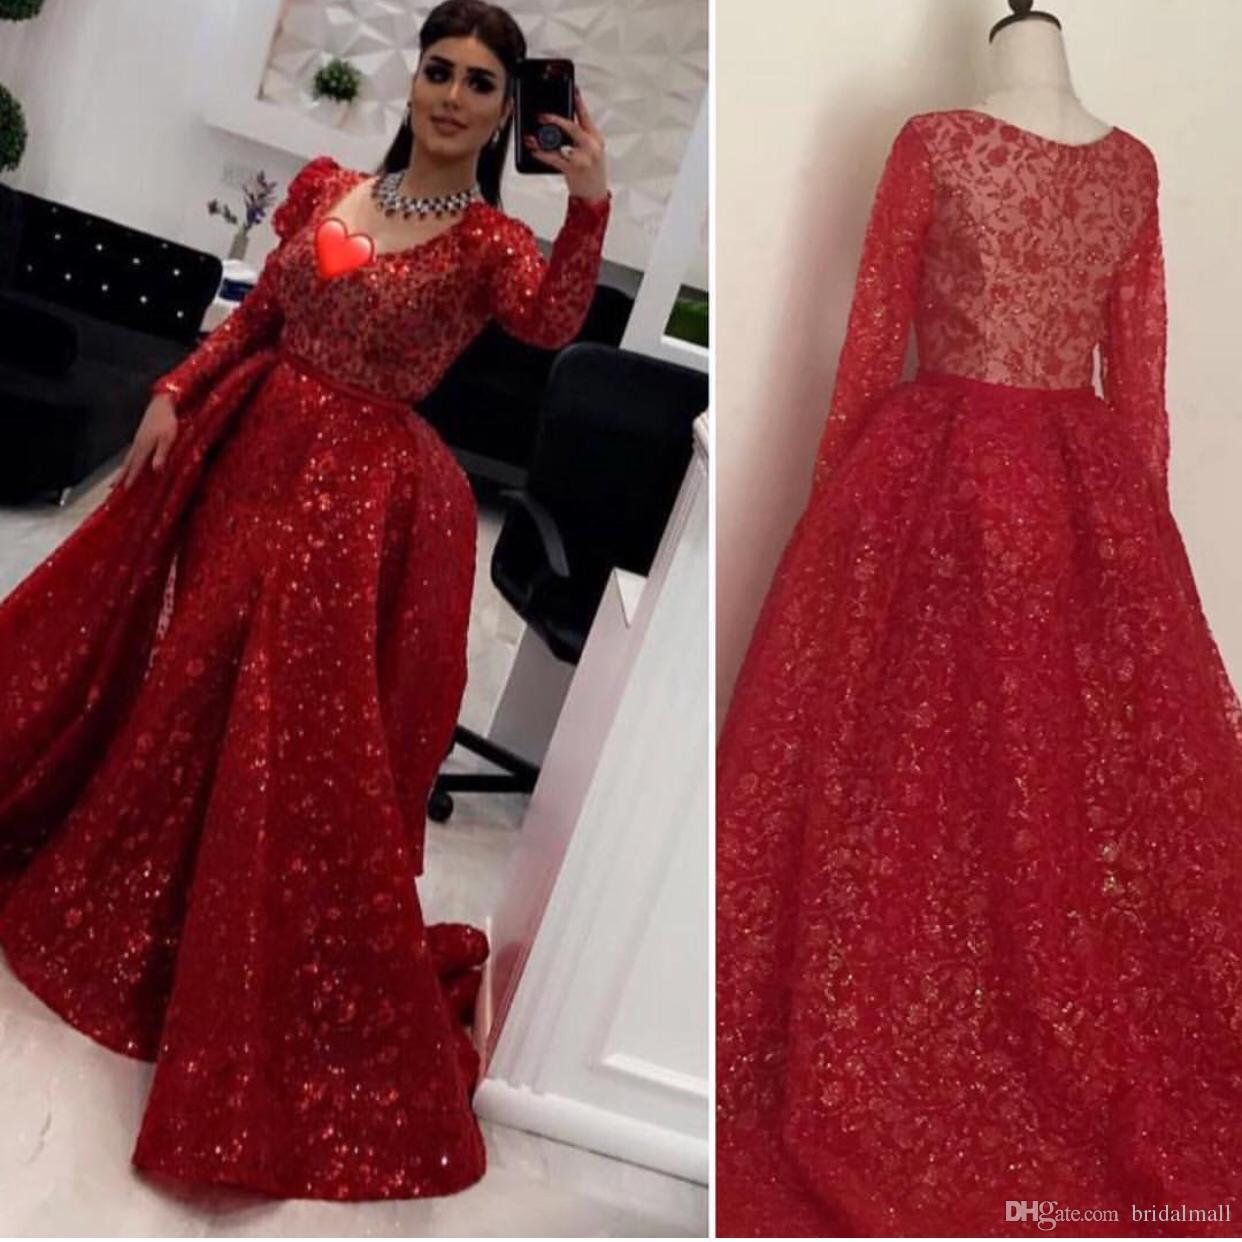 19db3f4e6452 Wine Red Lace Appliques Overskirt Evening Dresses 2019 Elegant V Neck Long  Sleeves Dubai Arabic Formal Dress Sheer Back Prom Dresses Mermaid Black  Formal ...